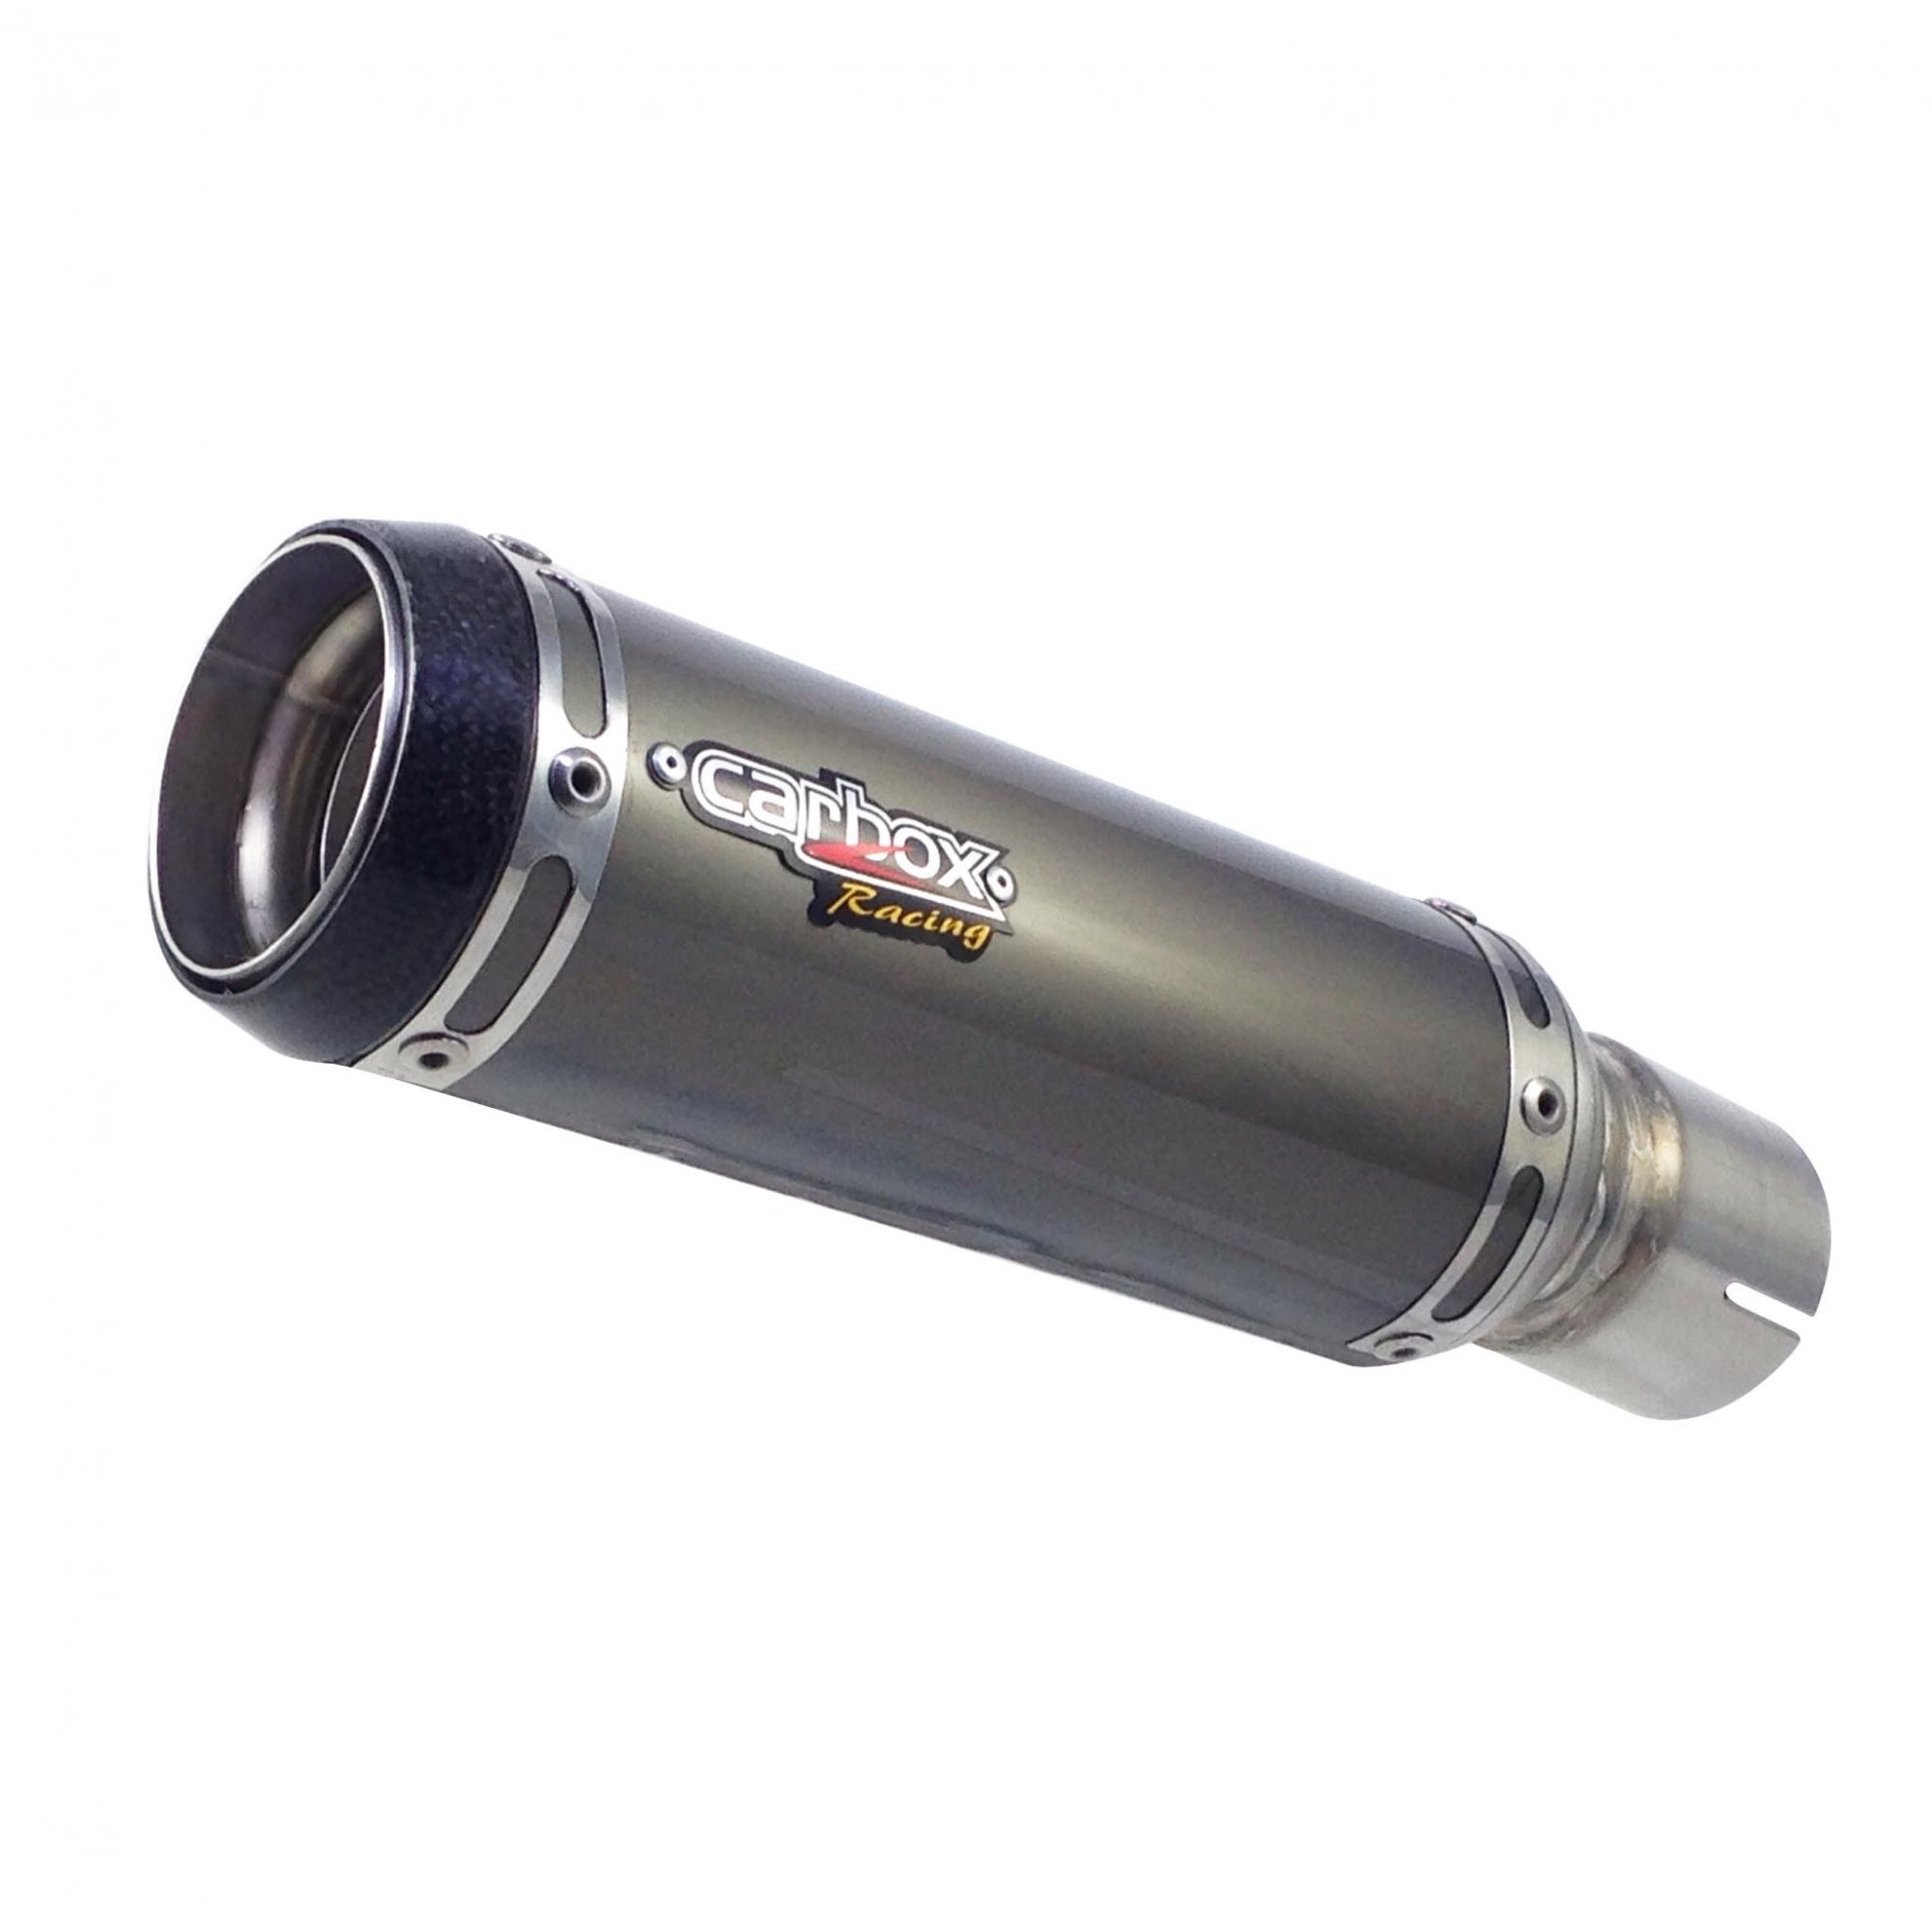 Ponteira Escape Full 4x2x1 Gp Tech Inox - Bmw S1000rr